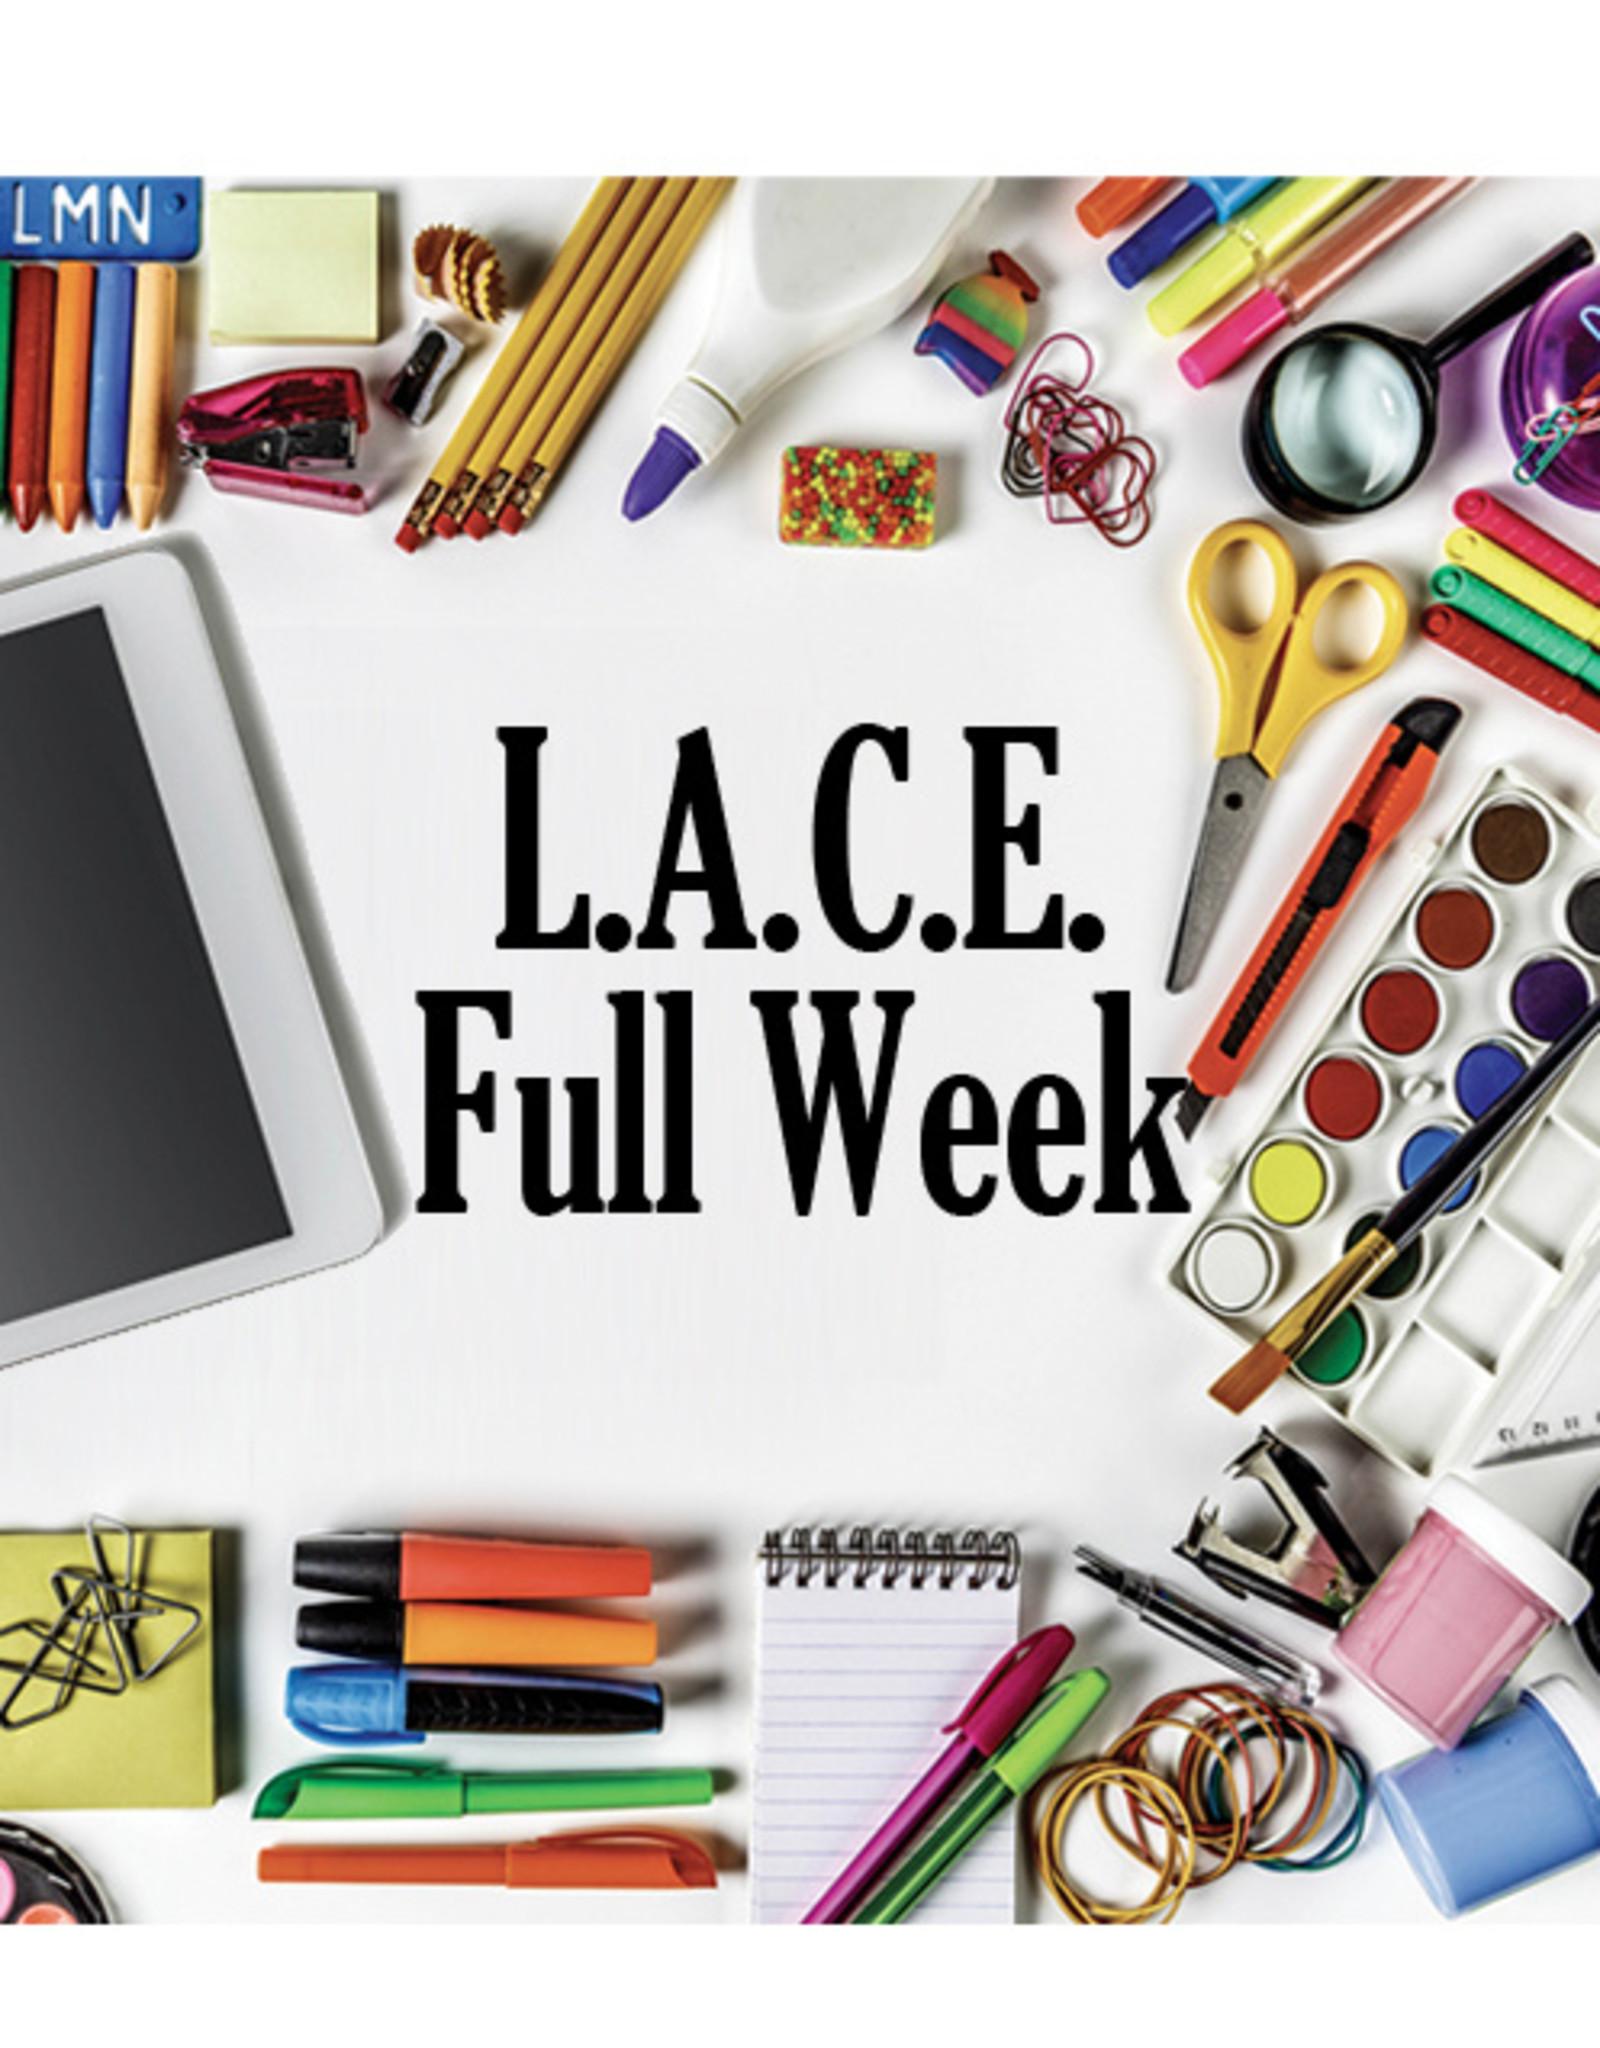 FTLA LACE Program: FULL Week M-F 9:00 am  to 4:00 pm